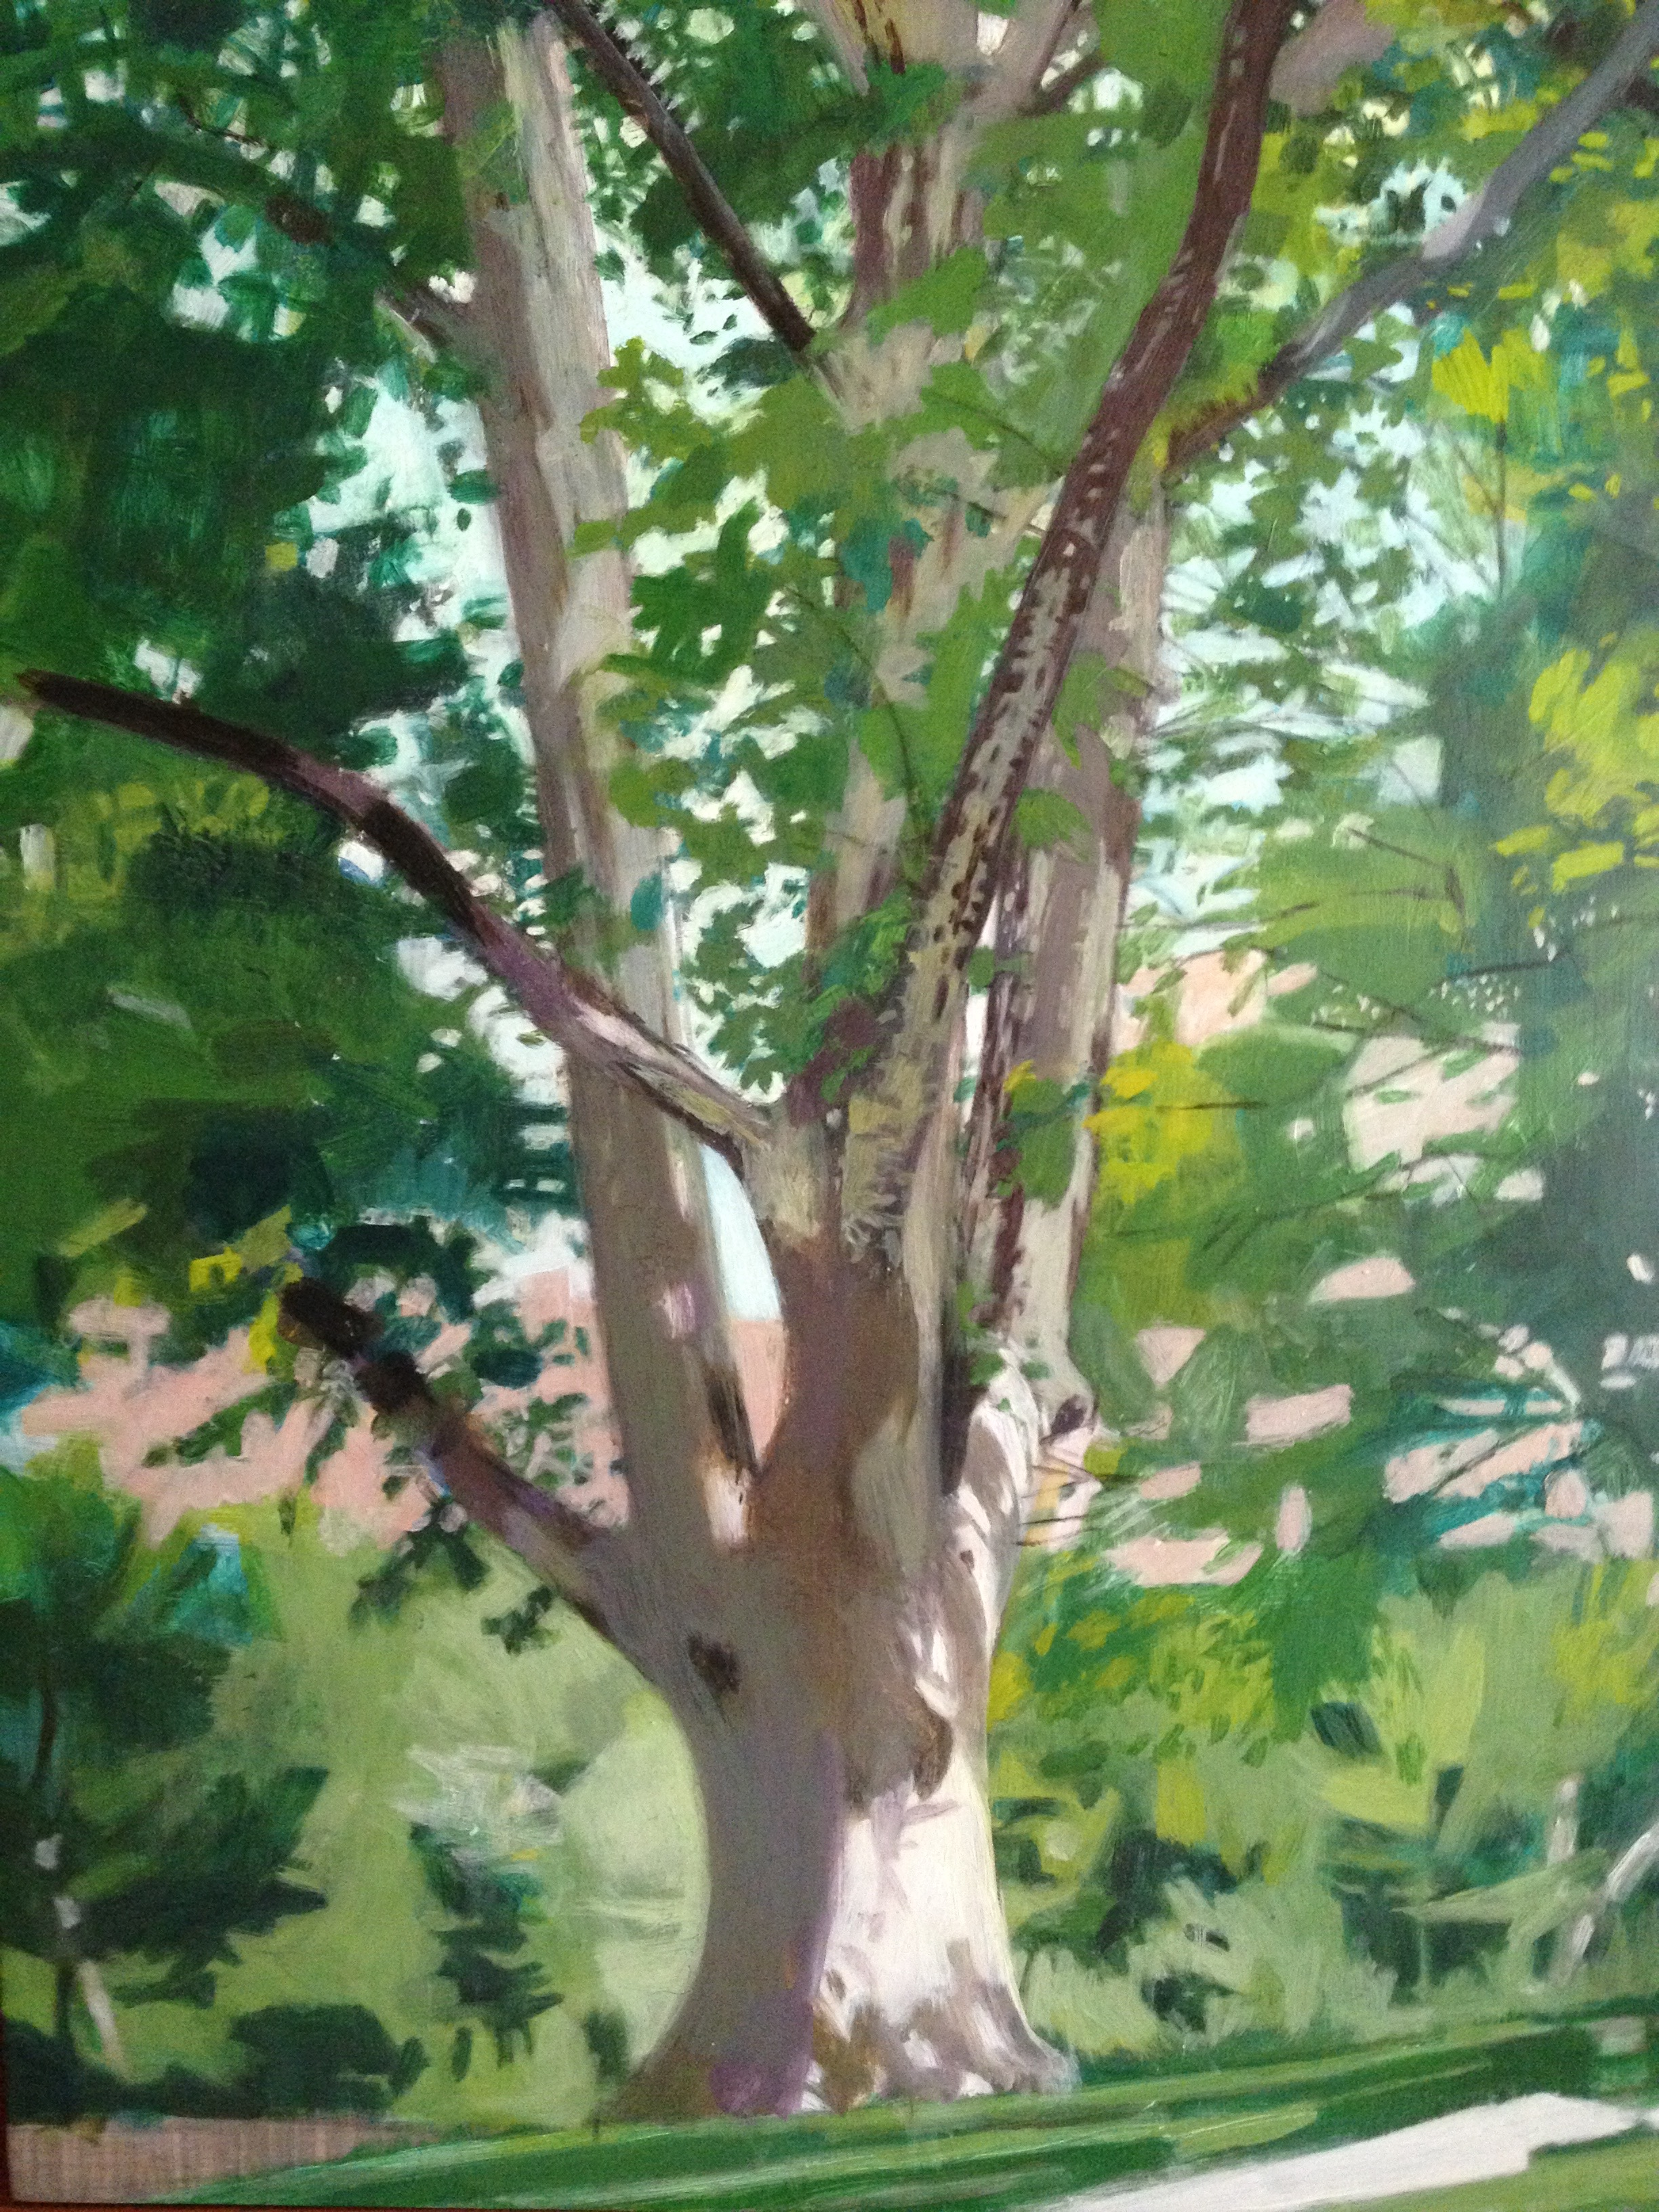 Watercolor on paper 12 x 9 inches Tarek Ashkar,2015